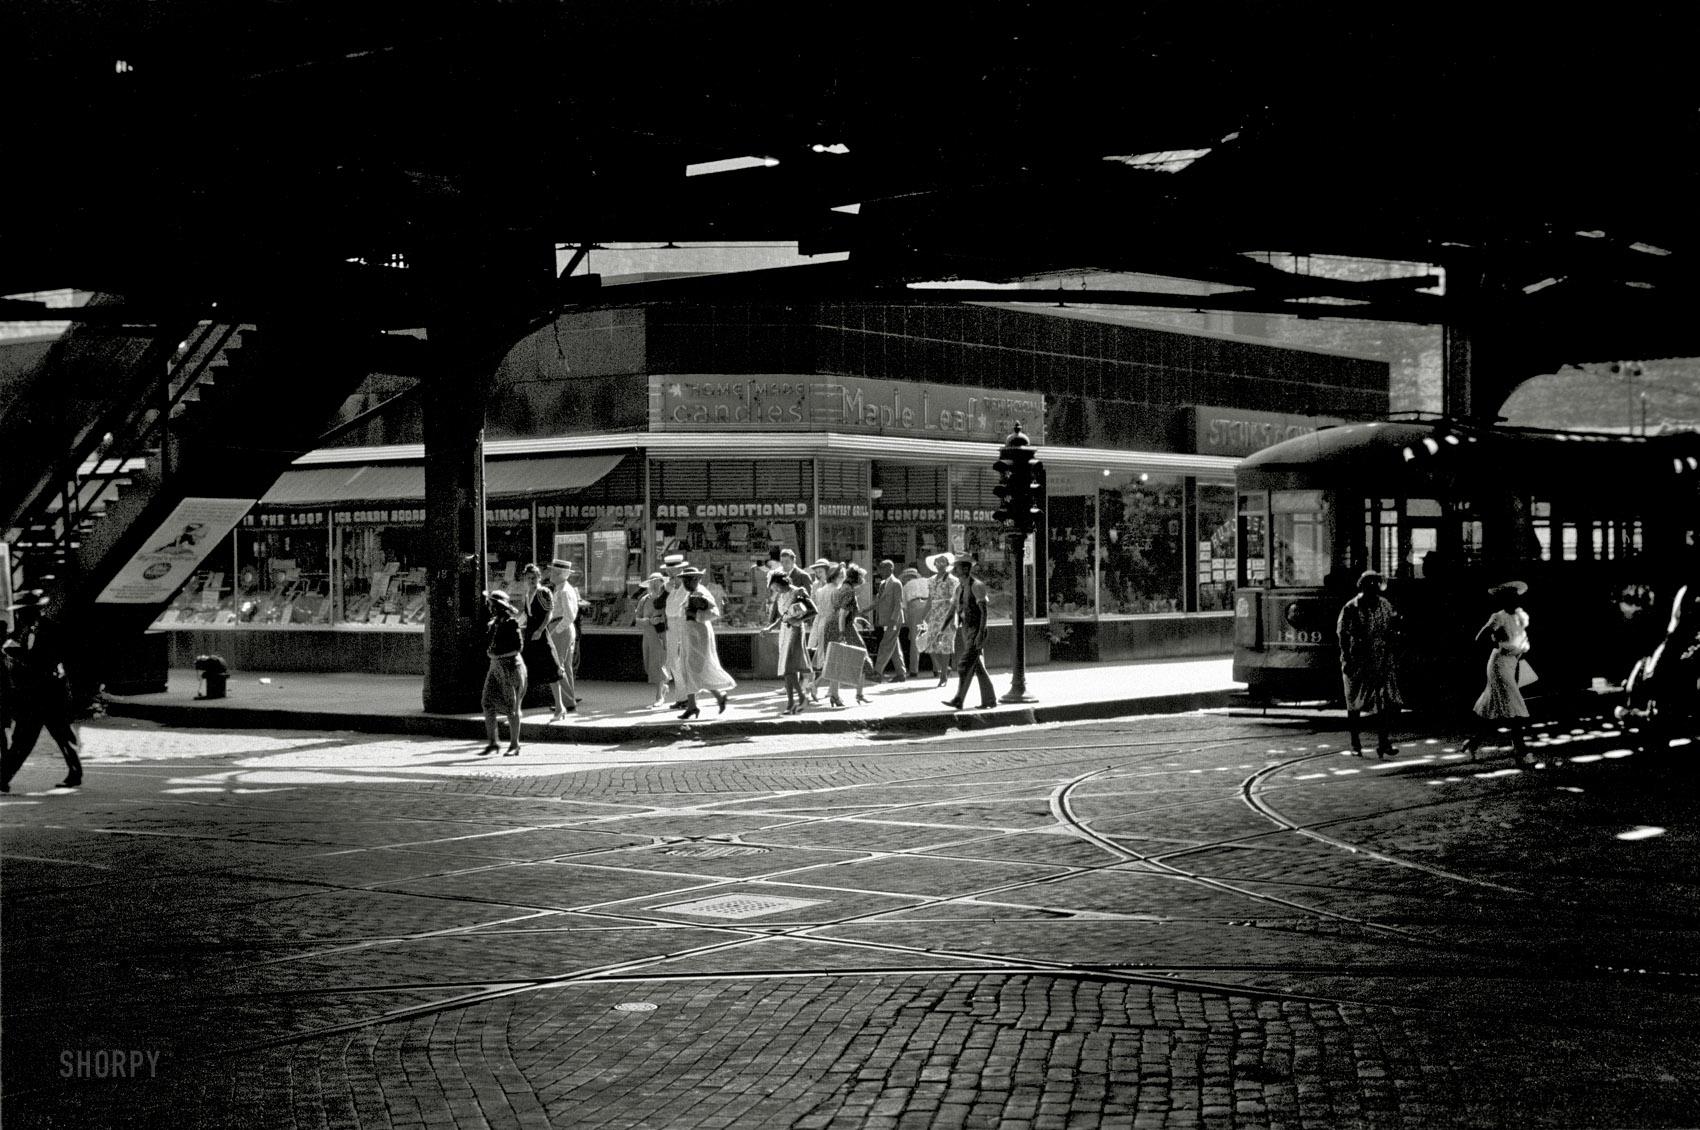 Chicago, Under the L, 1940